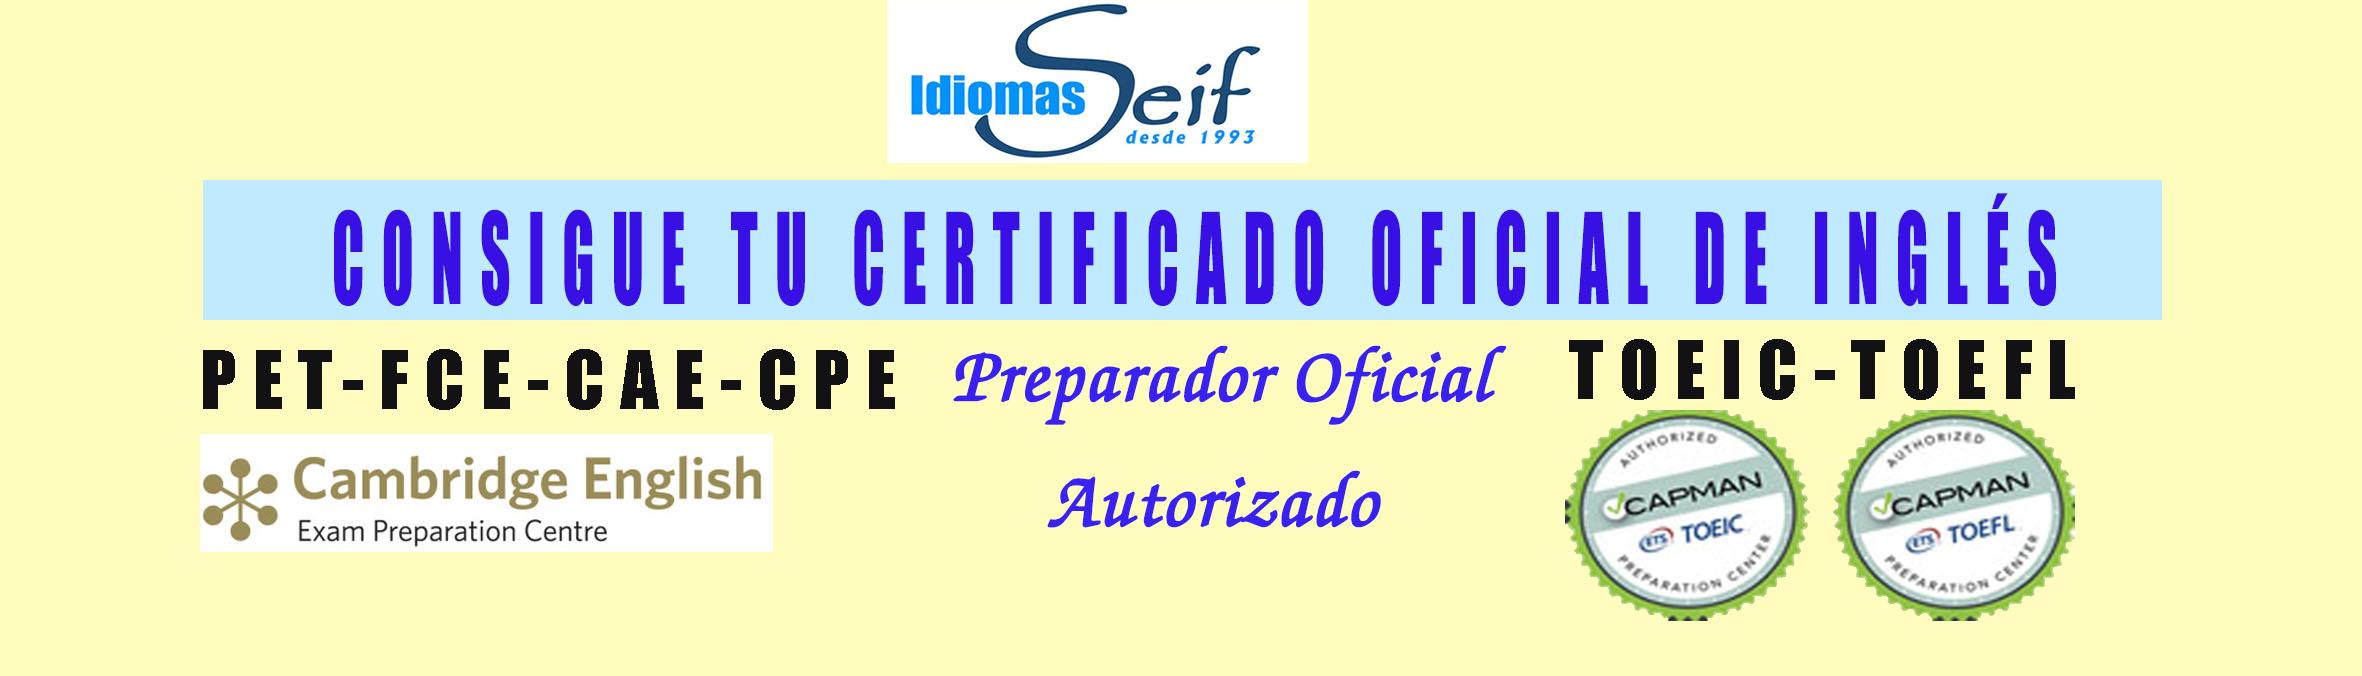 preparador oficial autorizado